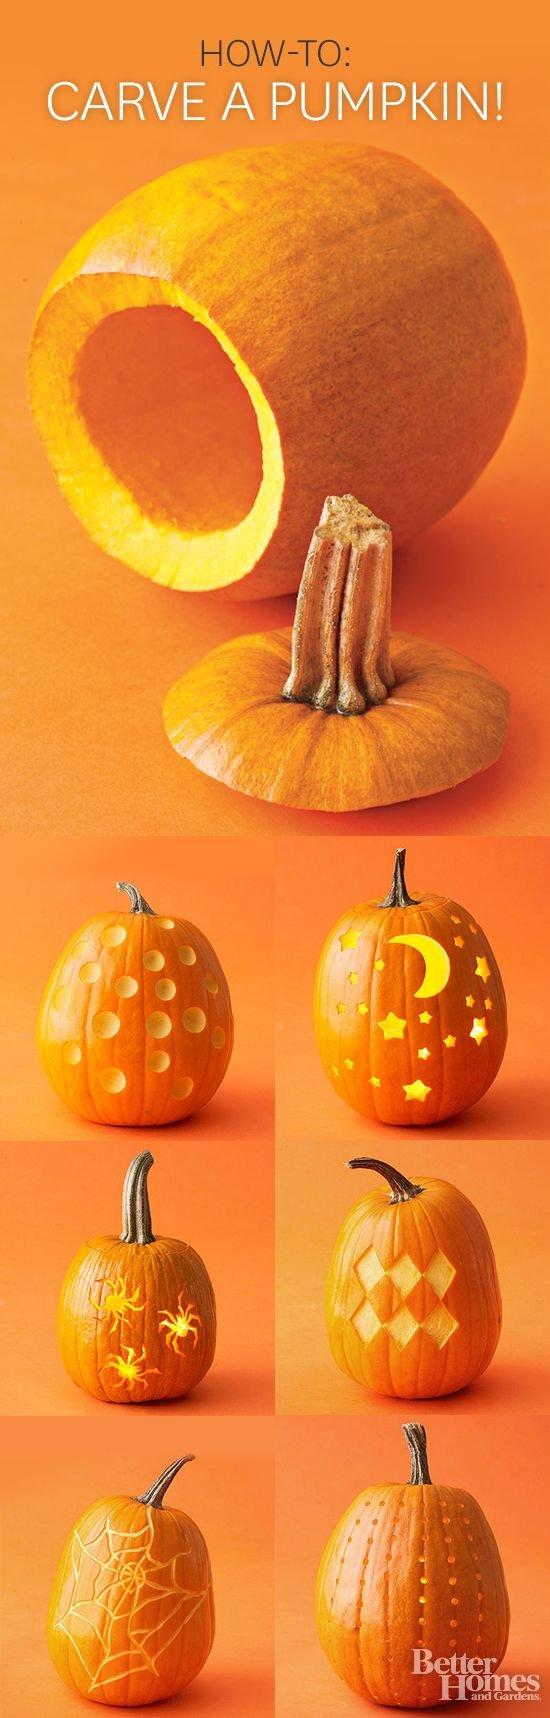 how to carve a pumpkin